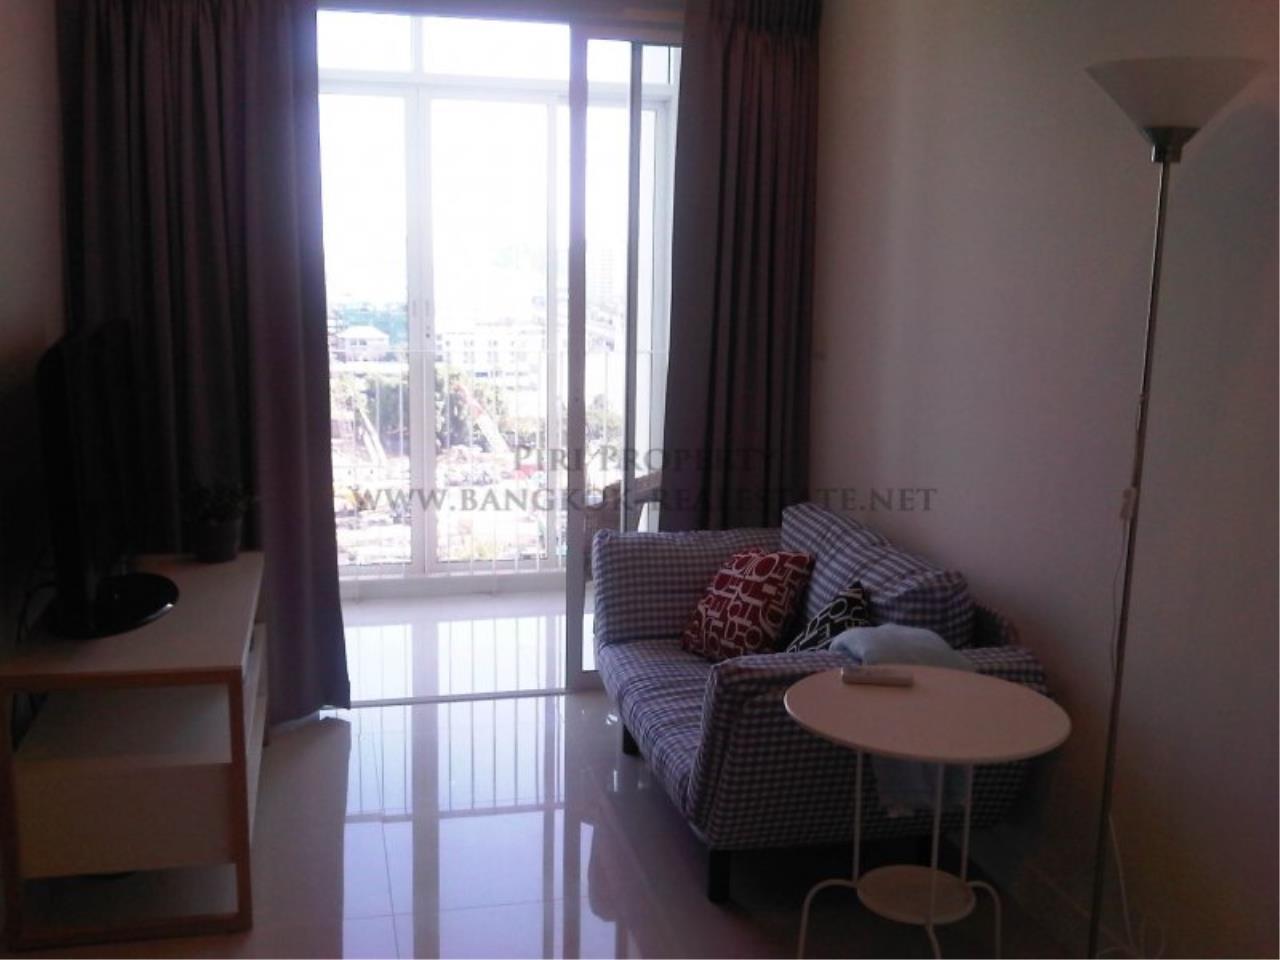 Piri Property Agency's 2 Bedroom - Modern and Brand New - IDEO Verve 1